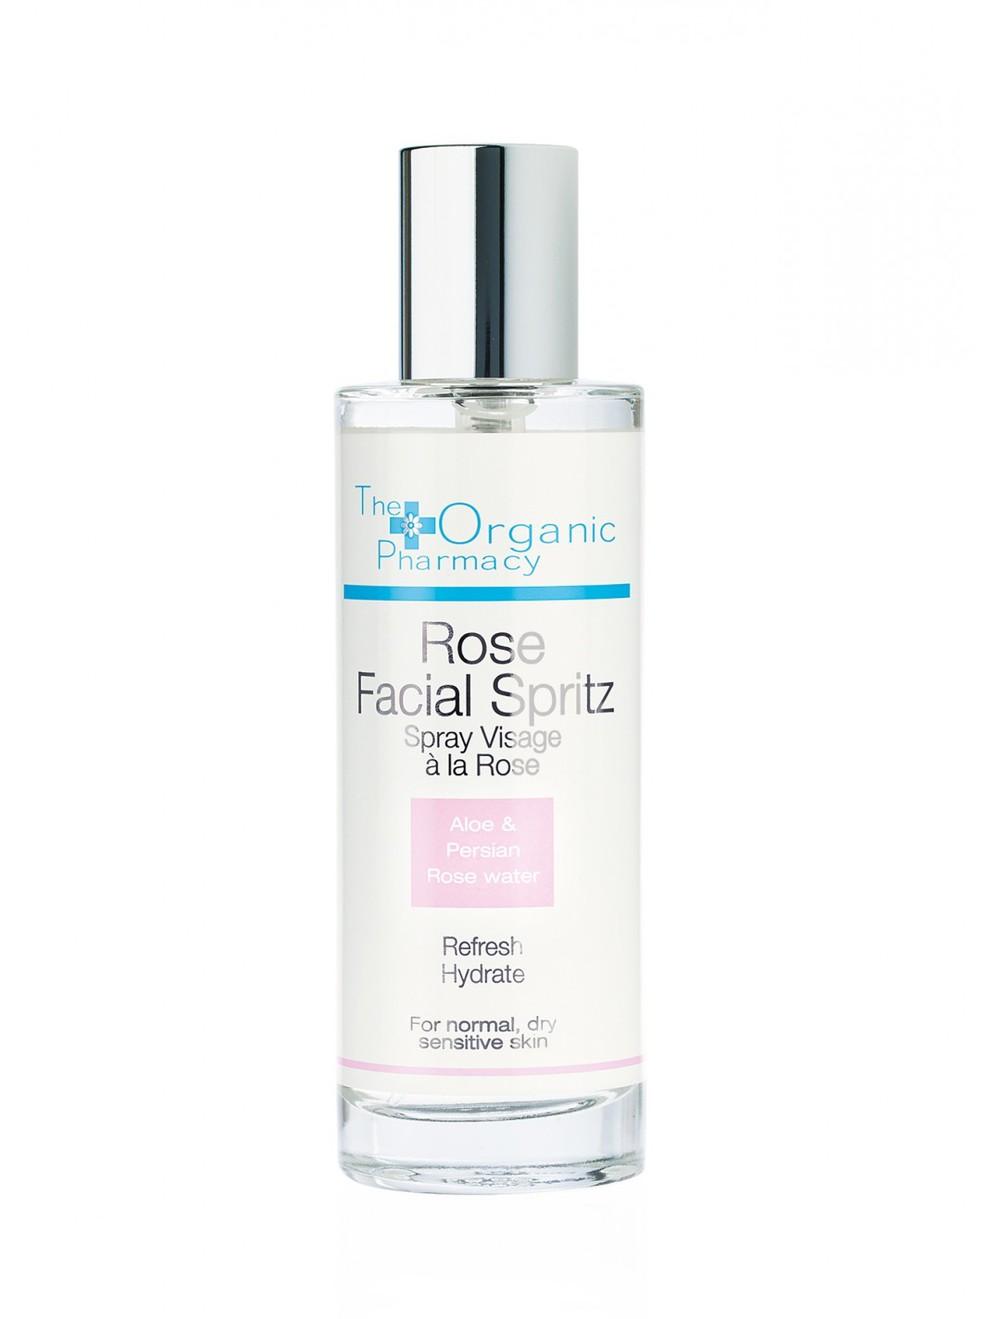 resized_1300x1800_0037_theorganicpharmacy_rosespritz.jpg